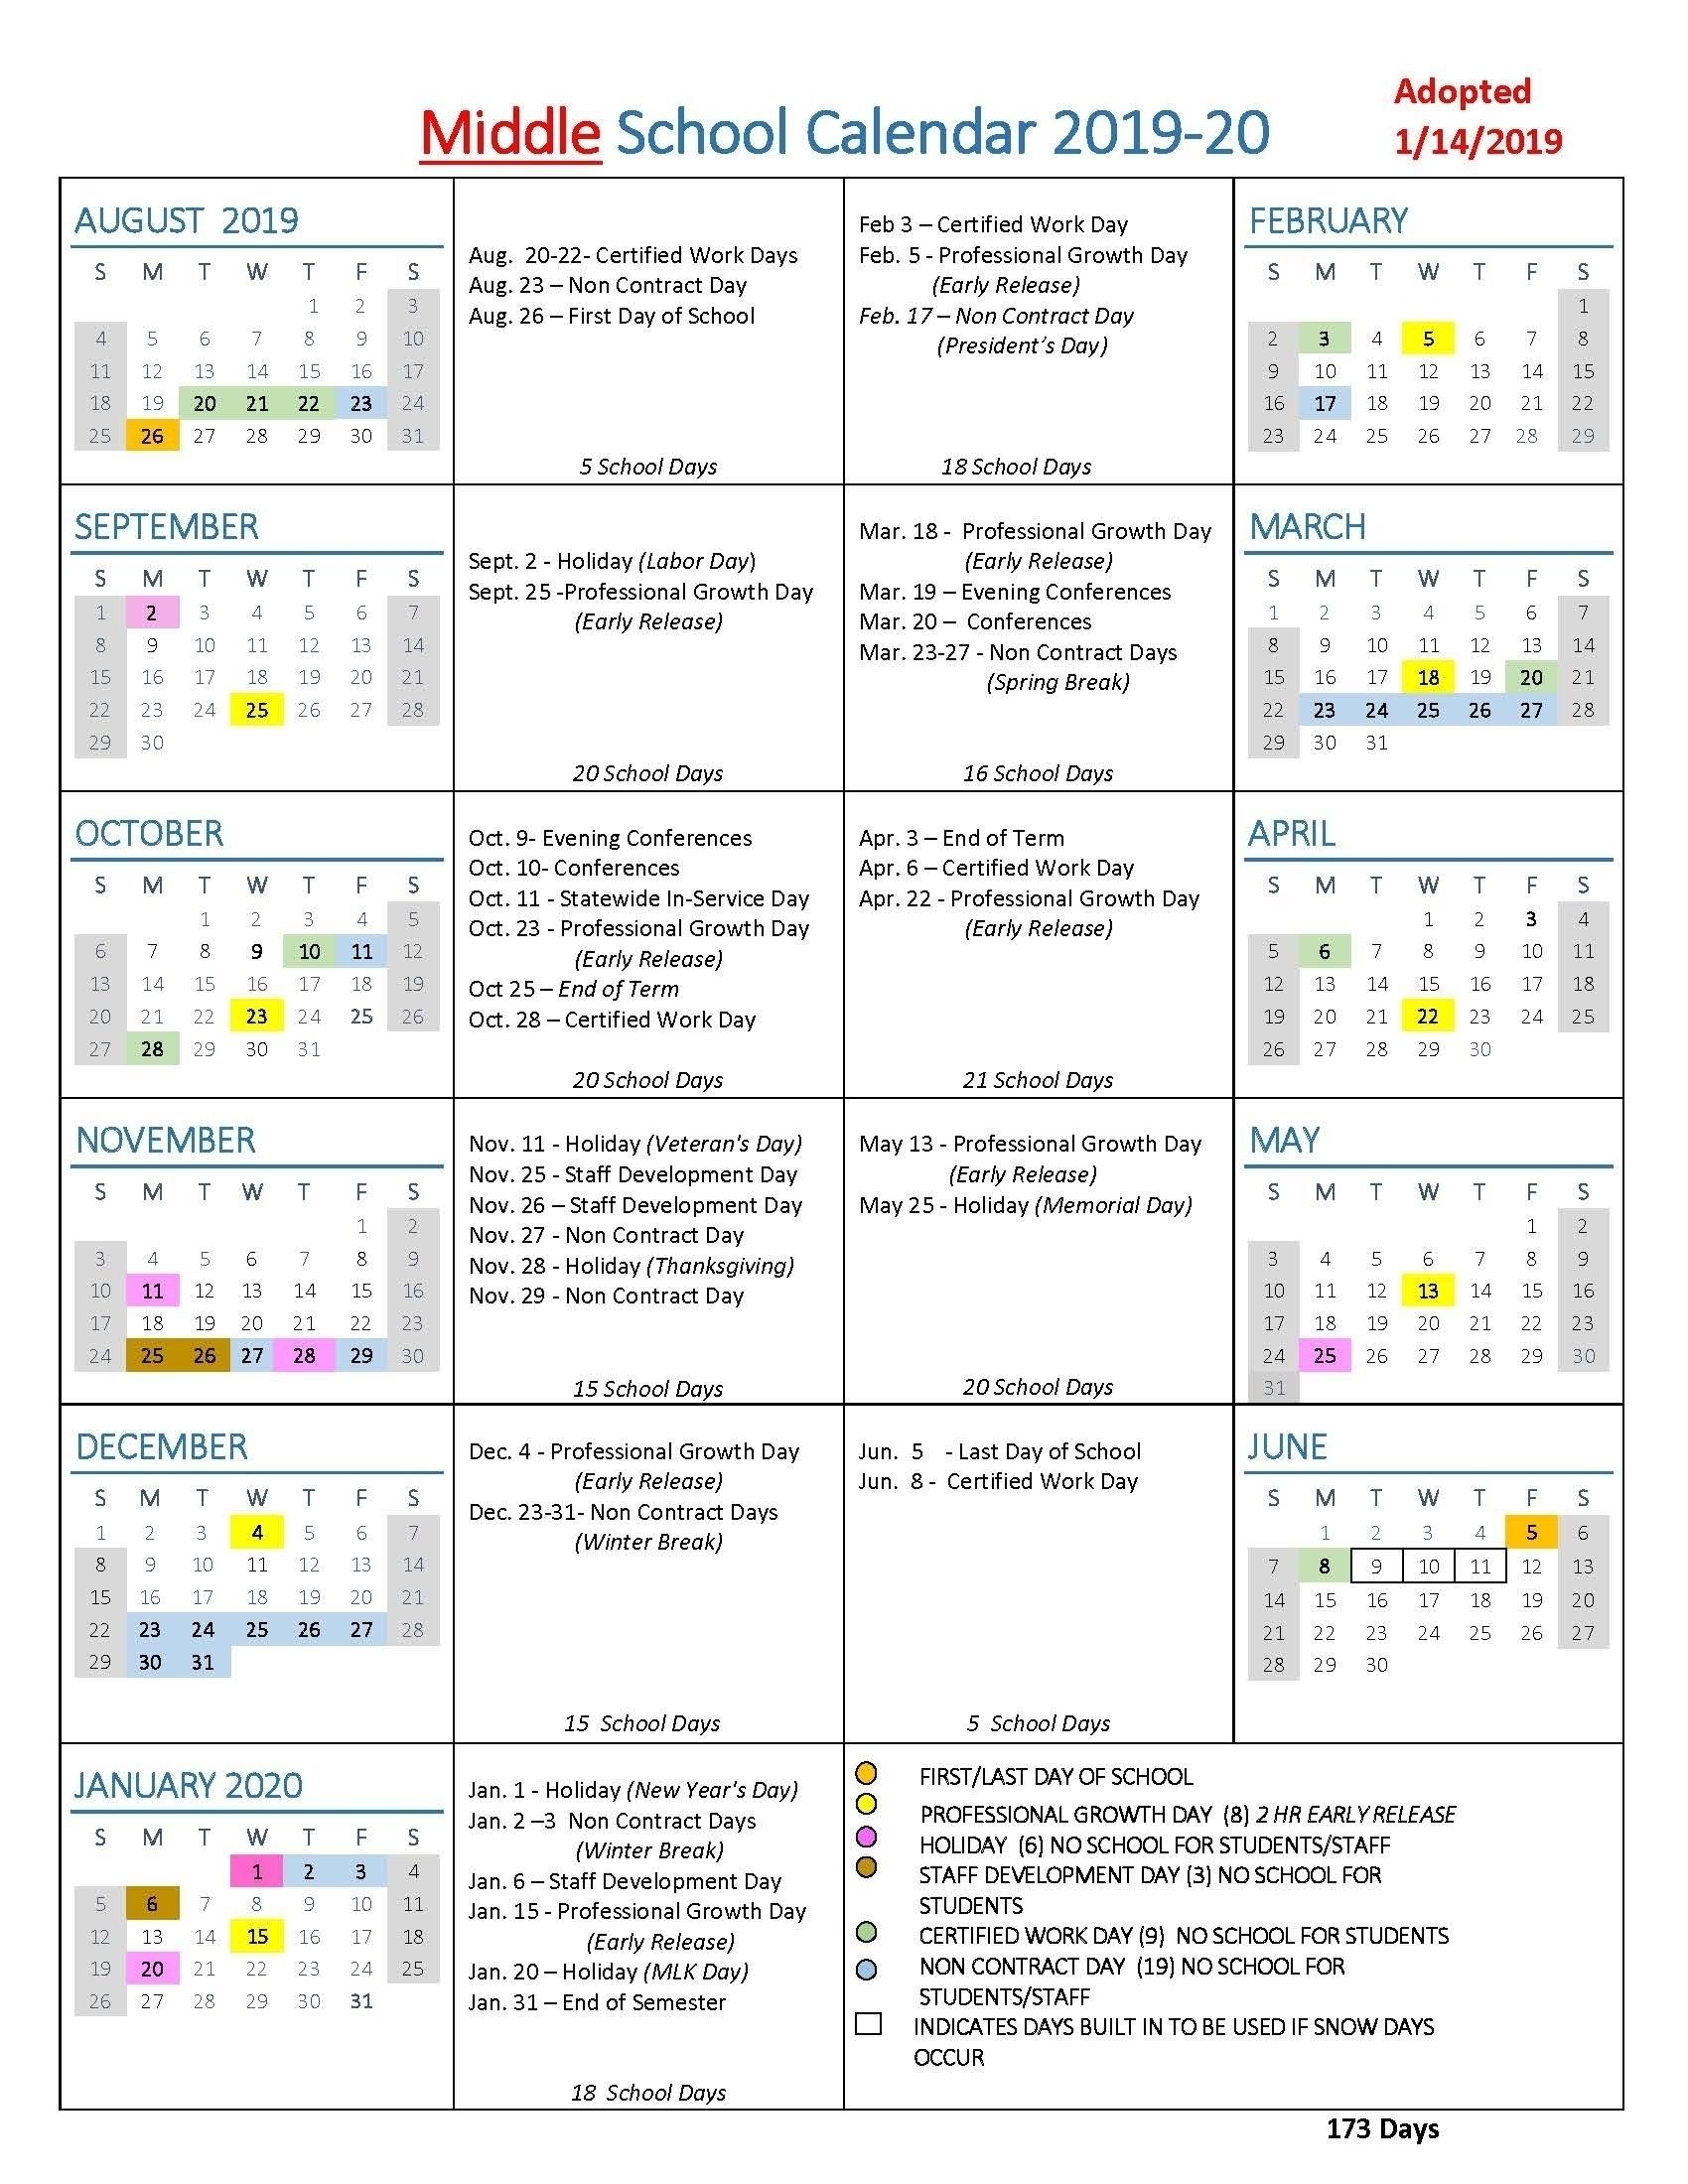 Special Days In 2020 Calendar - Calendar Inspiration Design with Special Days Of The Year 2020 Calendar